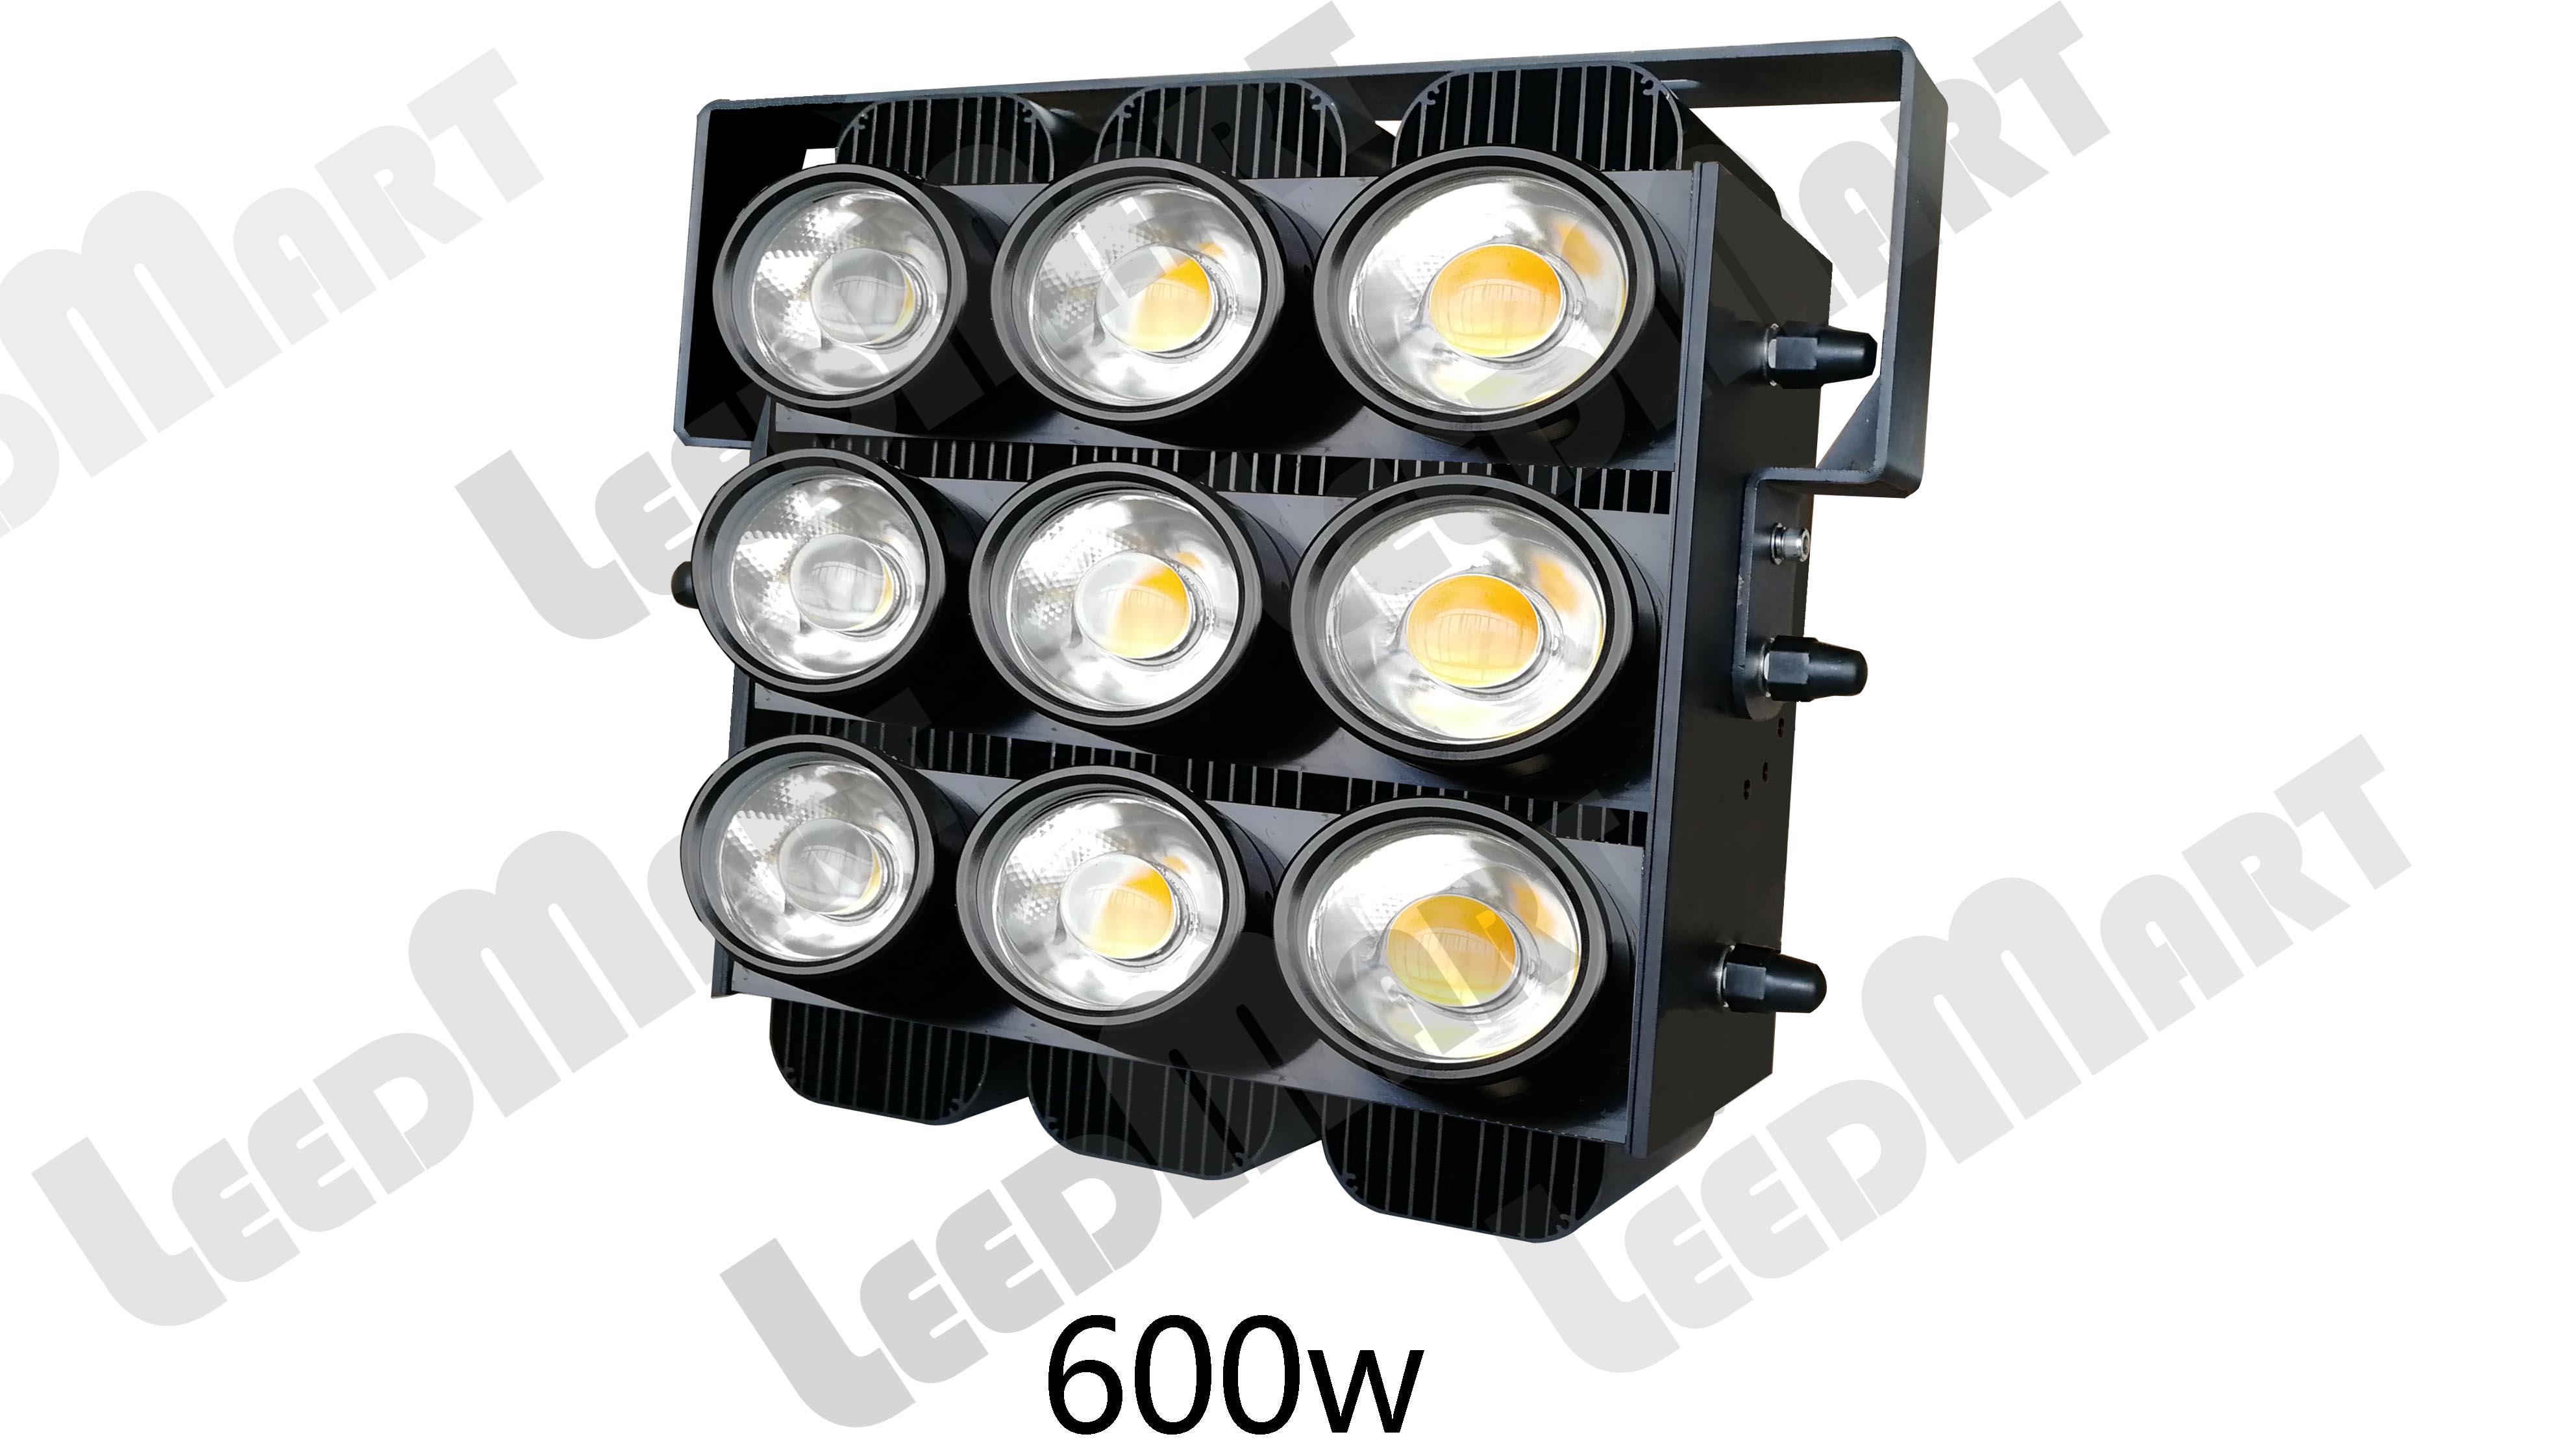 Dustproof 200 watt -600 watt 78000 lumen IP65 LED power crane flood Light